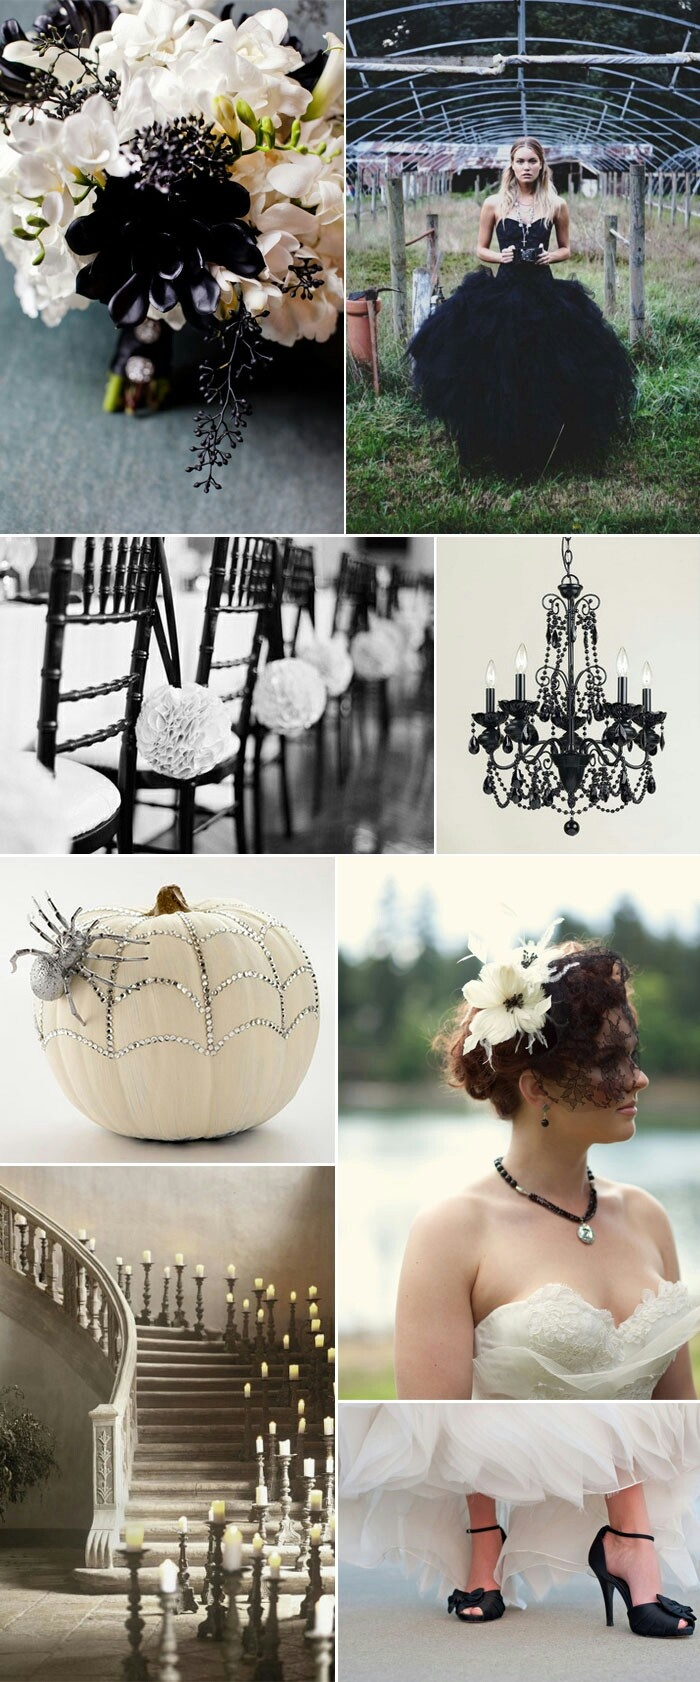 Best 25+ Halloween themed weddings ideas on Pinterest | Masquerade ...